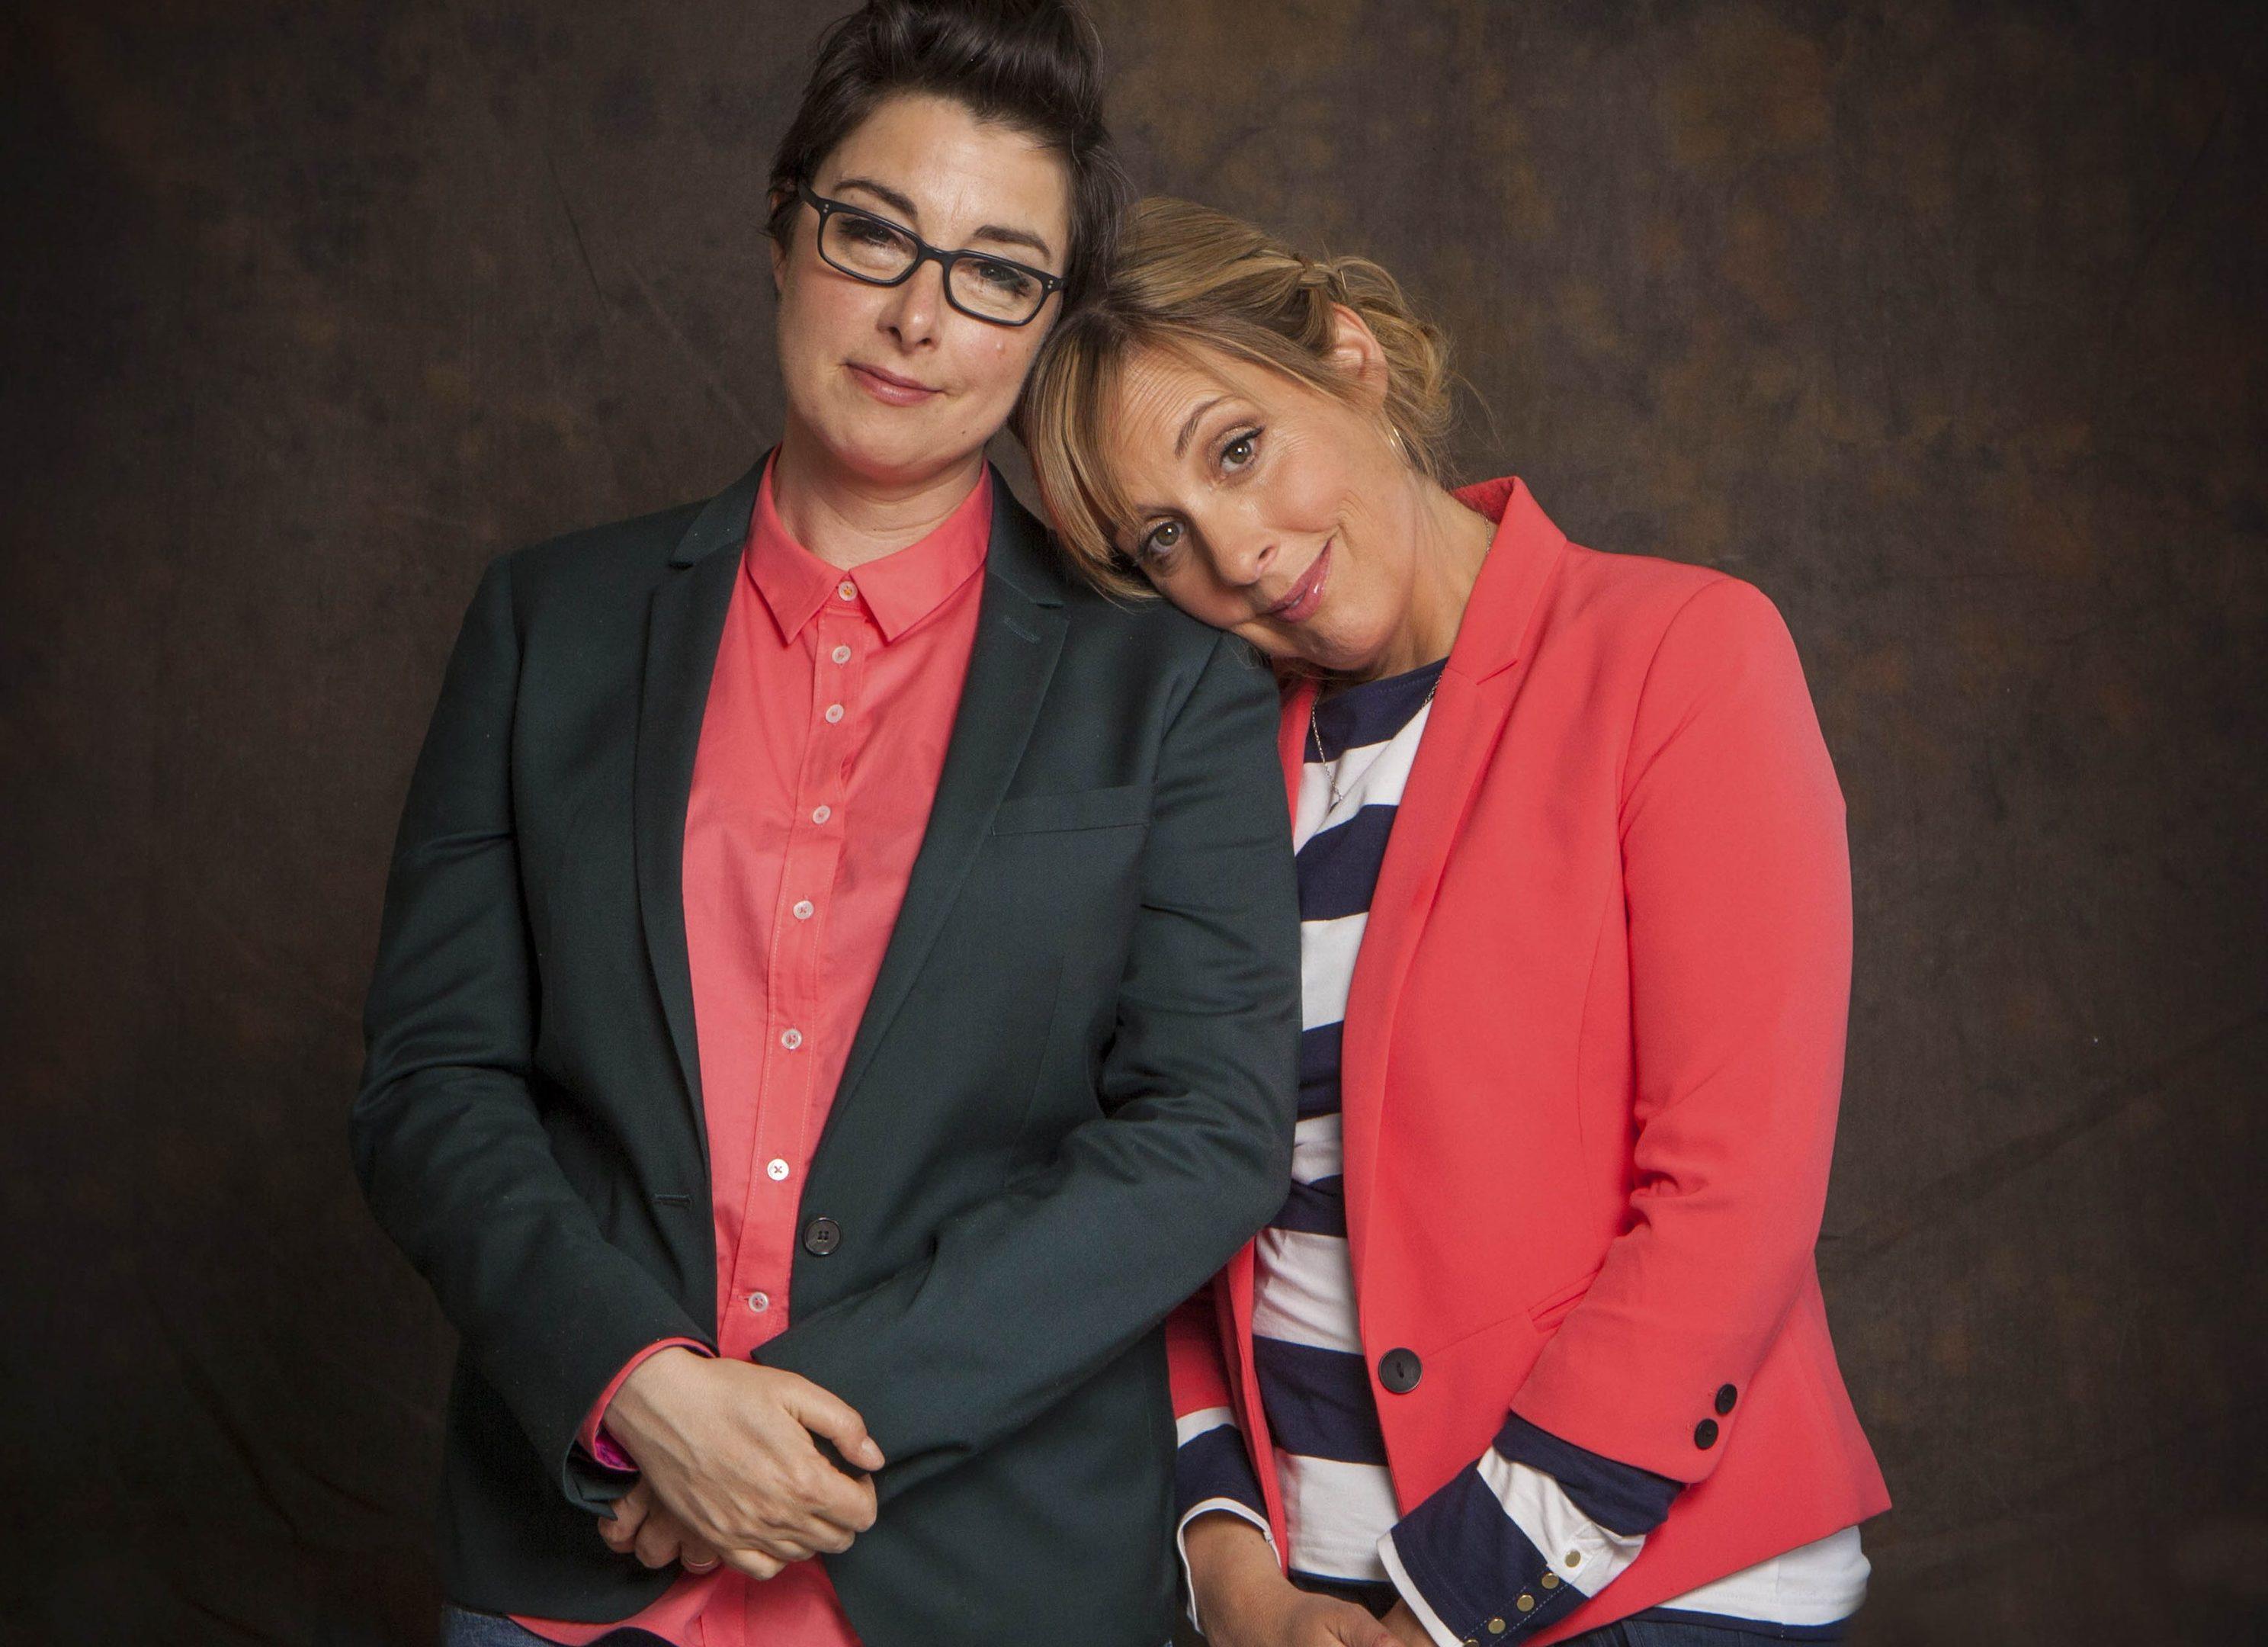 Sue Perkins and Mel Giedroyc (Love Productions/ Mark Bourdillon)